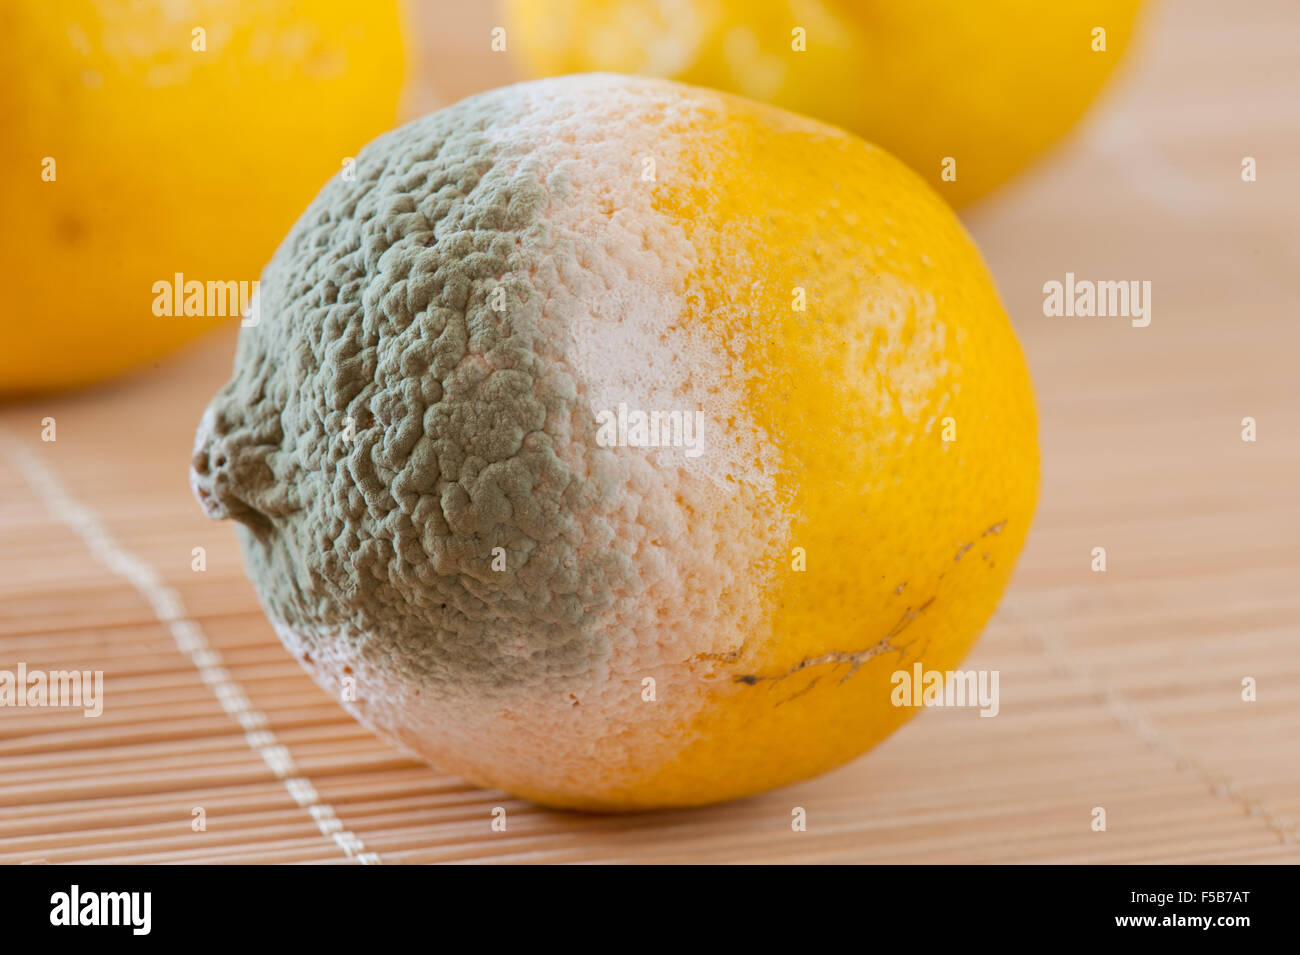 Mouldy Fruit Stock Photos & Mouldy Fruit Stock Images